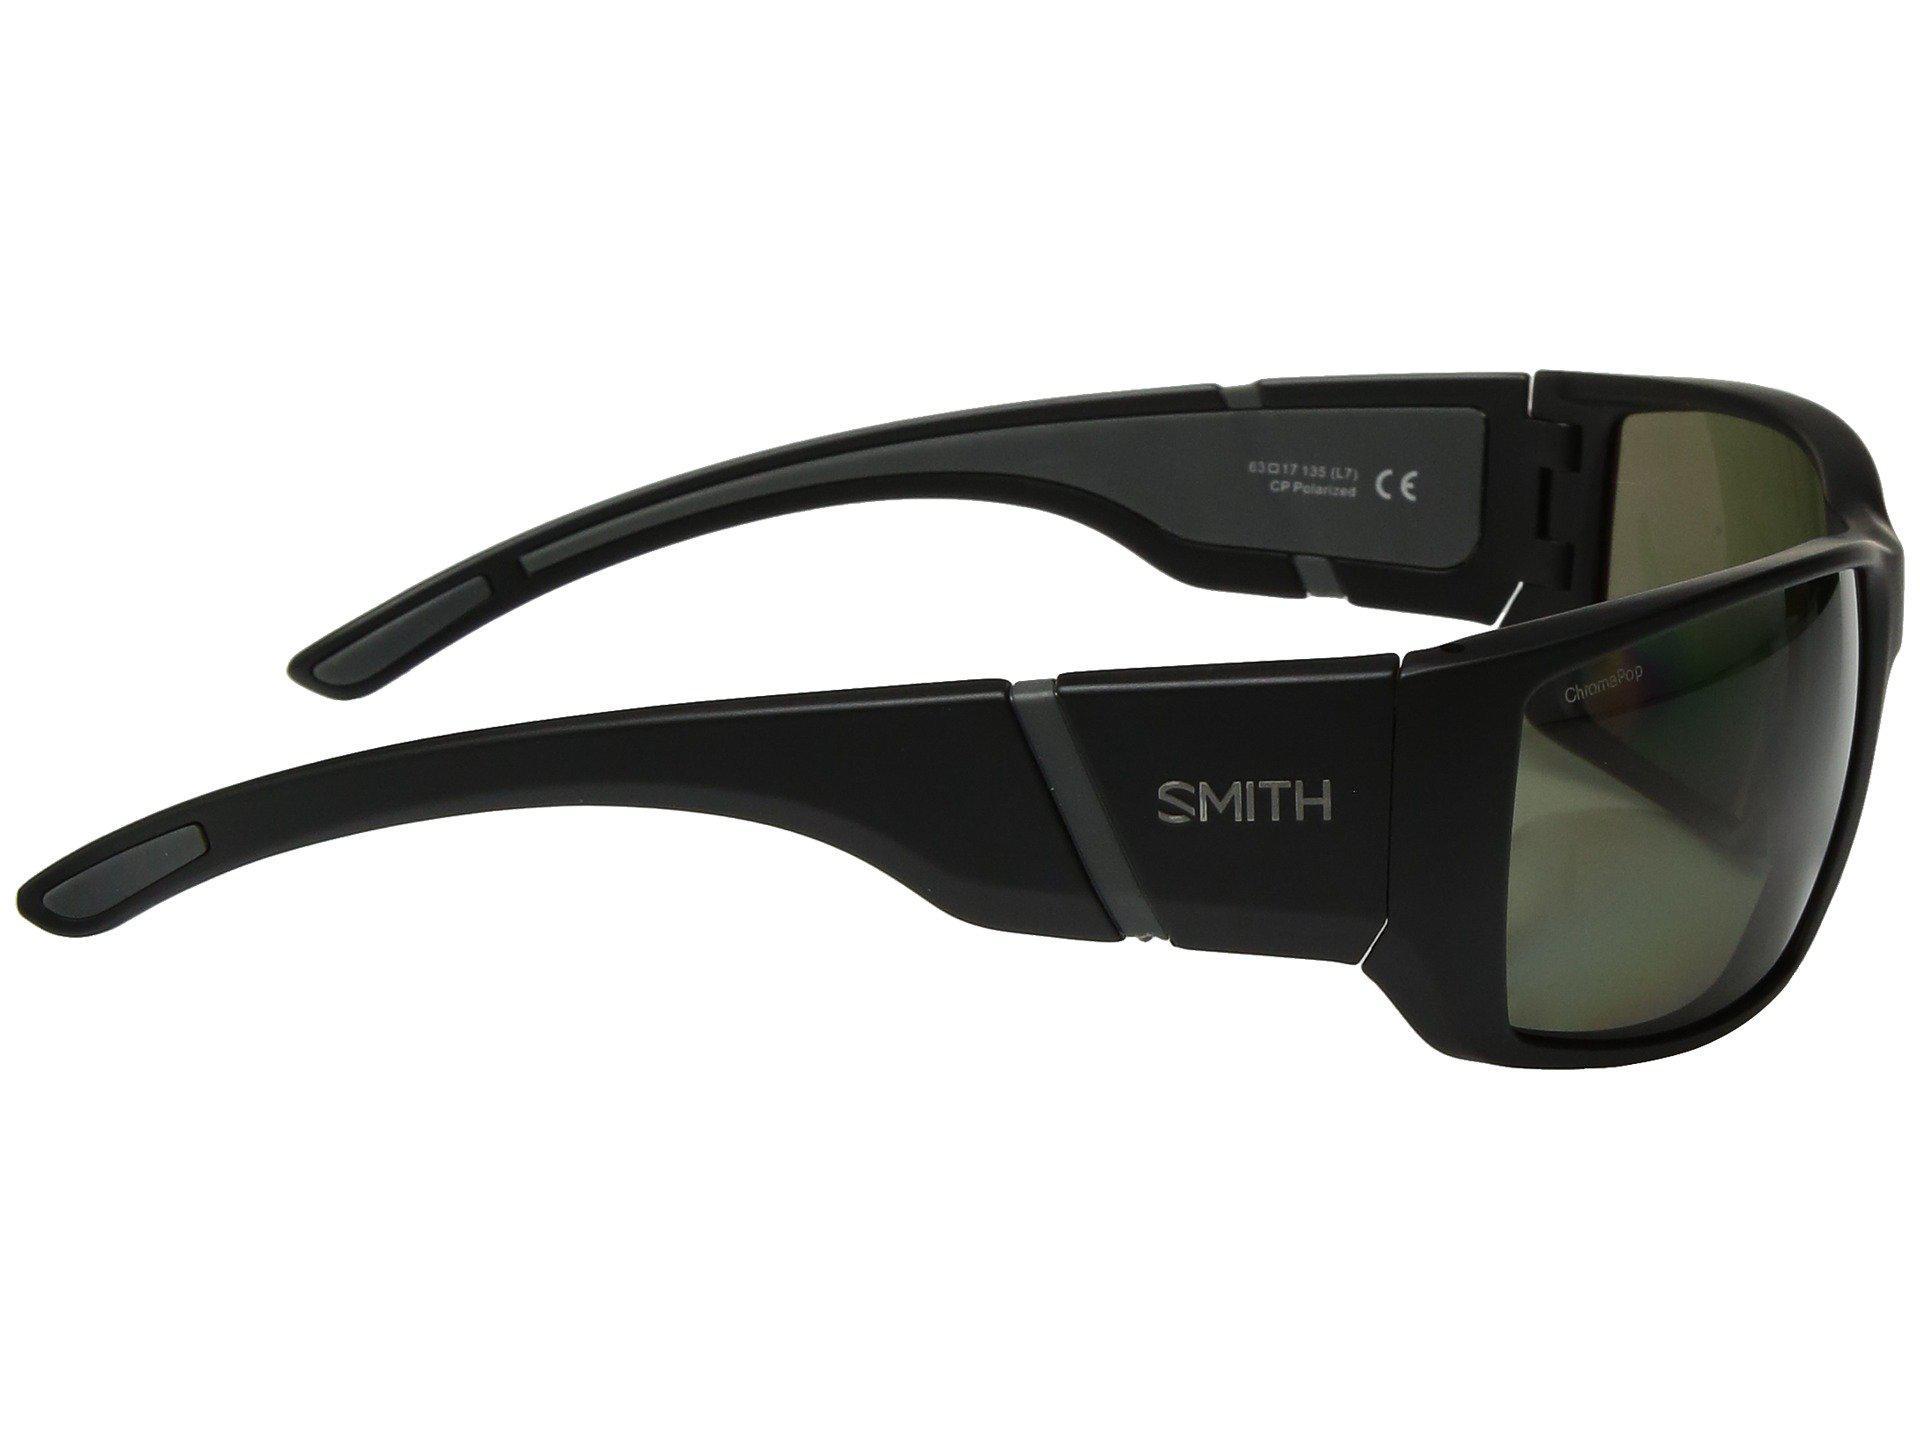 83ba3e19f06 Smith Optics - Transfer (matte Black gray Green Chromapoptm Polarized Lens) Athletic  Performance. View fullscreen